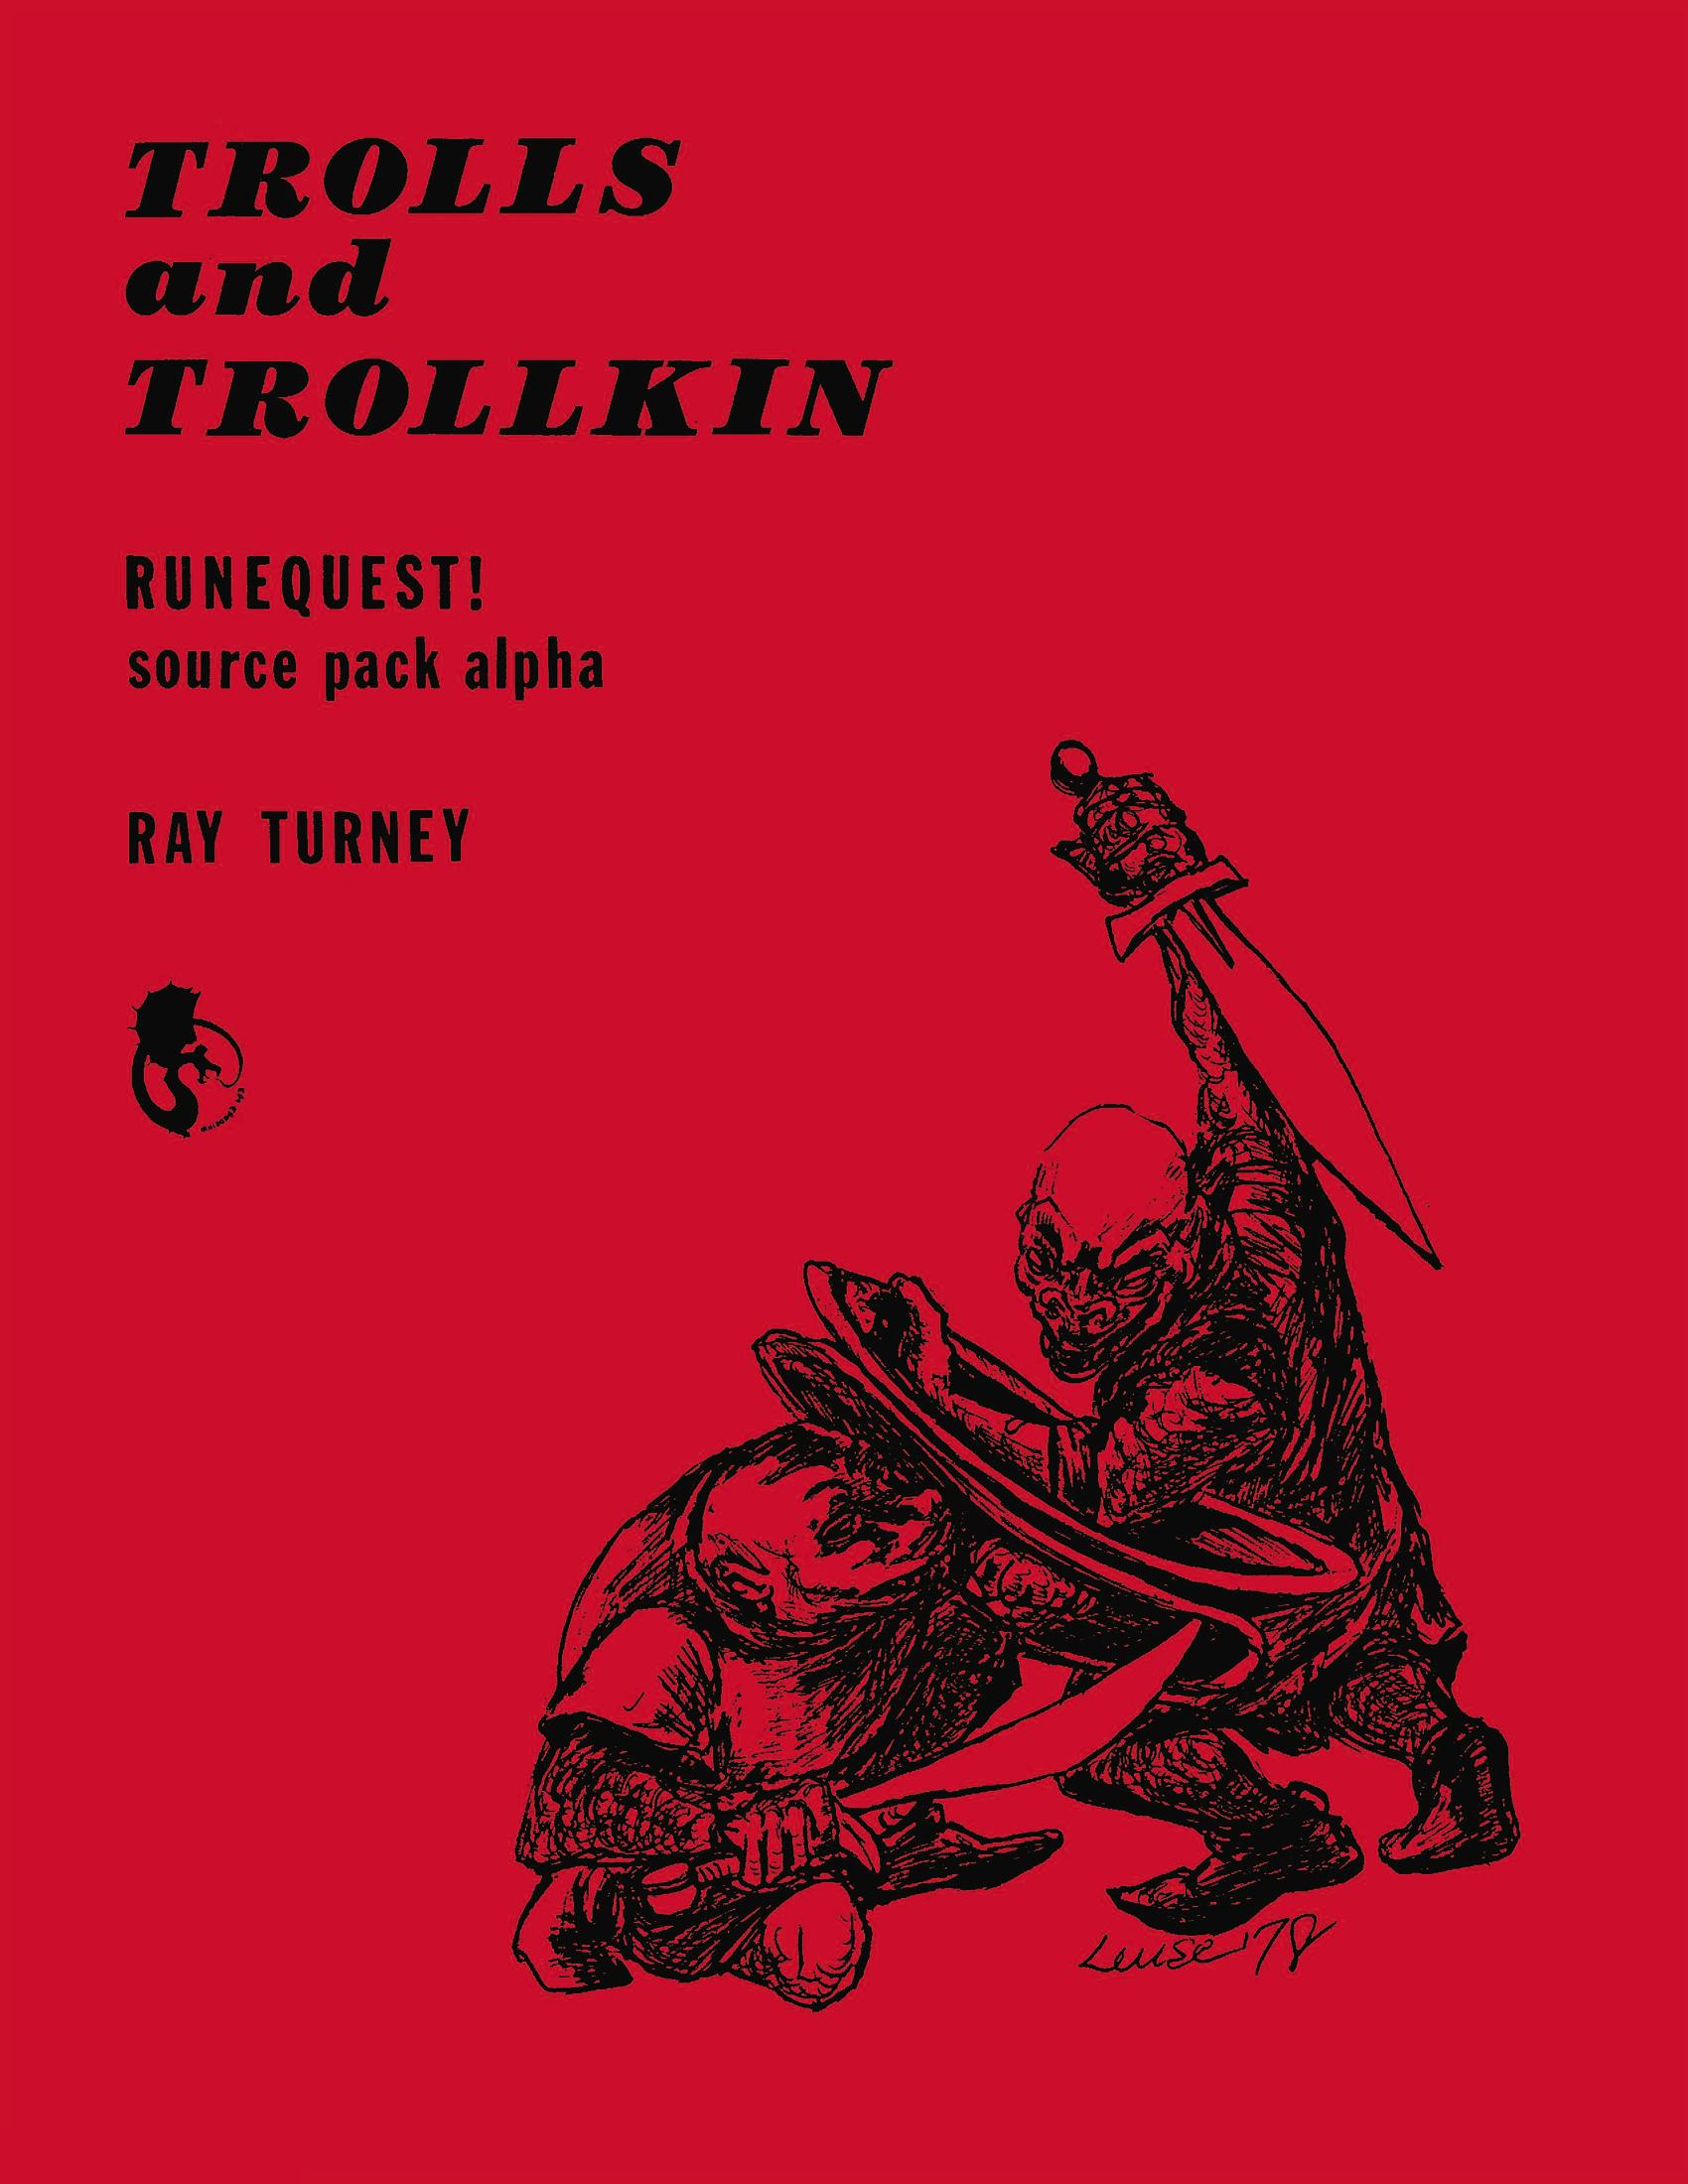 Trolls and Trollkin